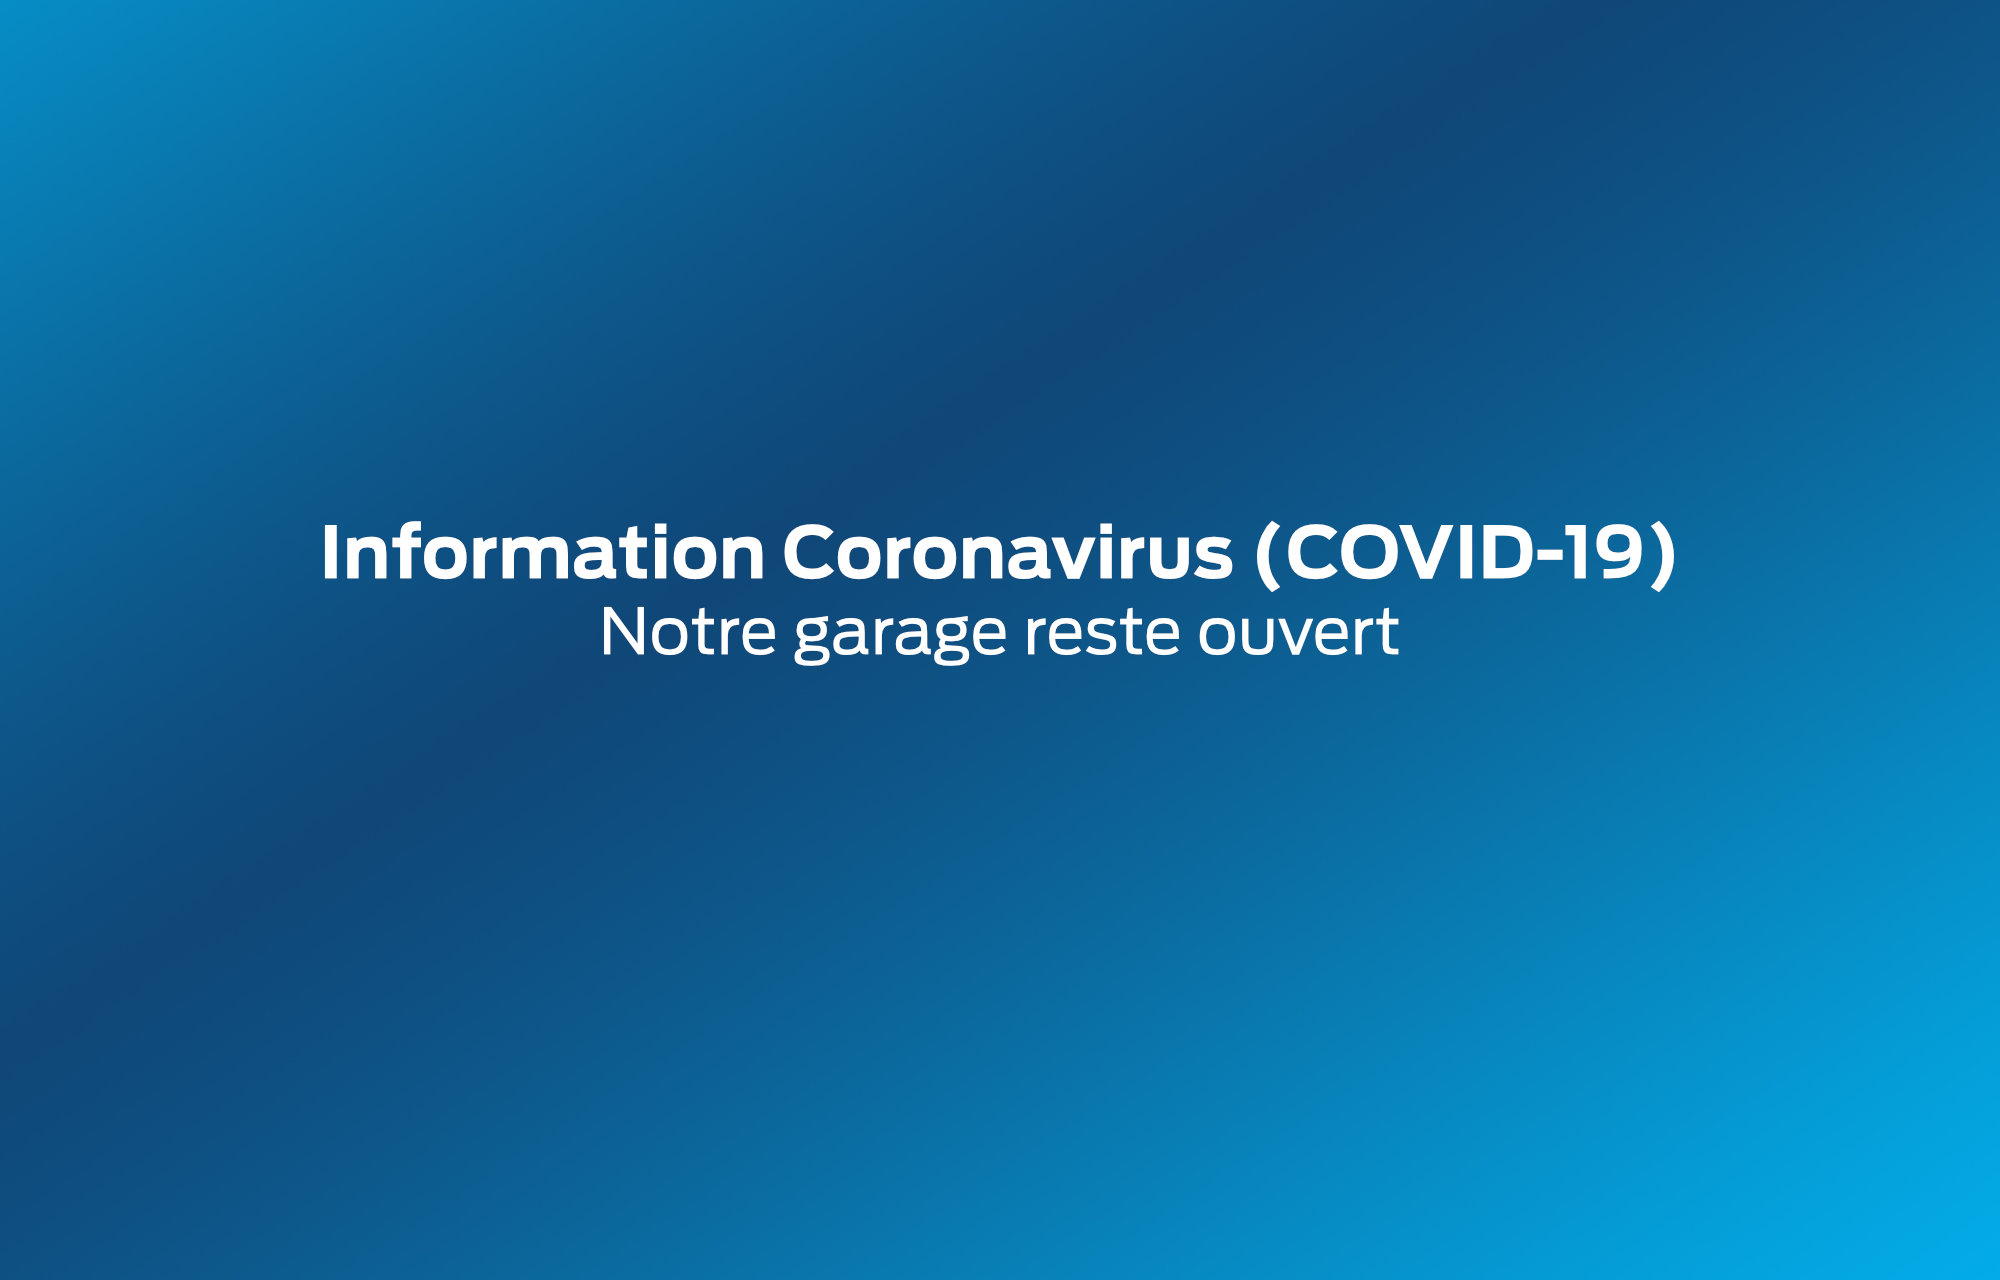 **Information importante : Notre garage reste ouvert**